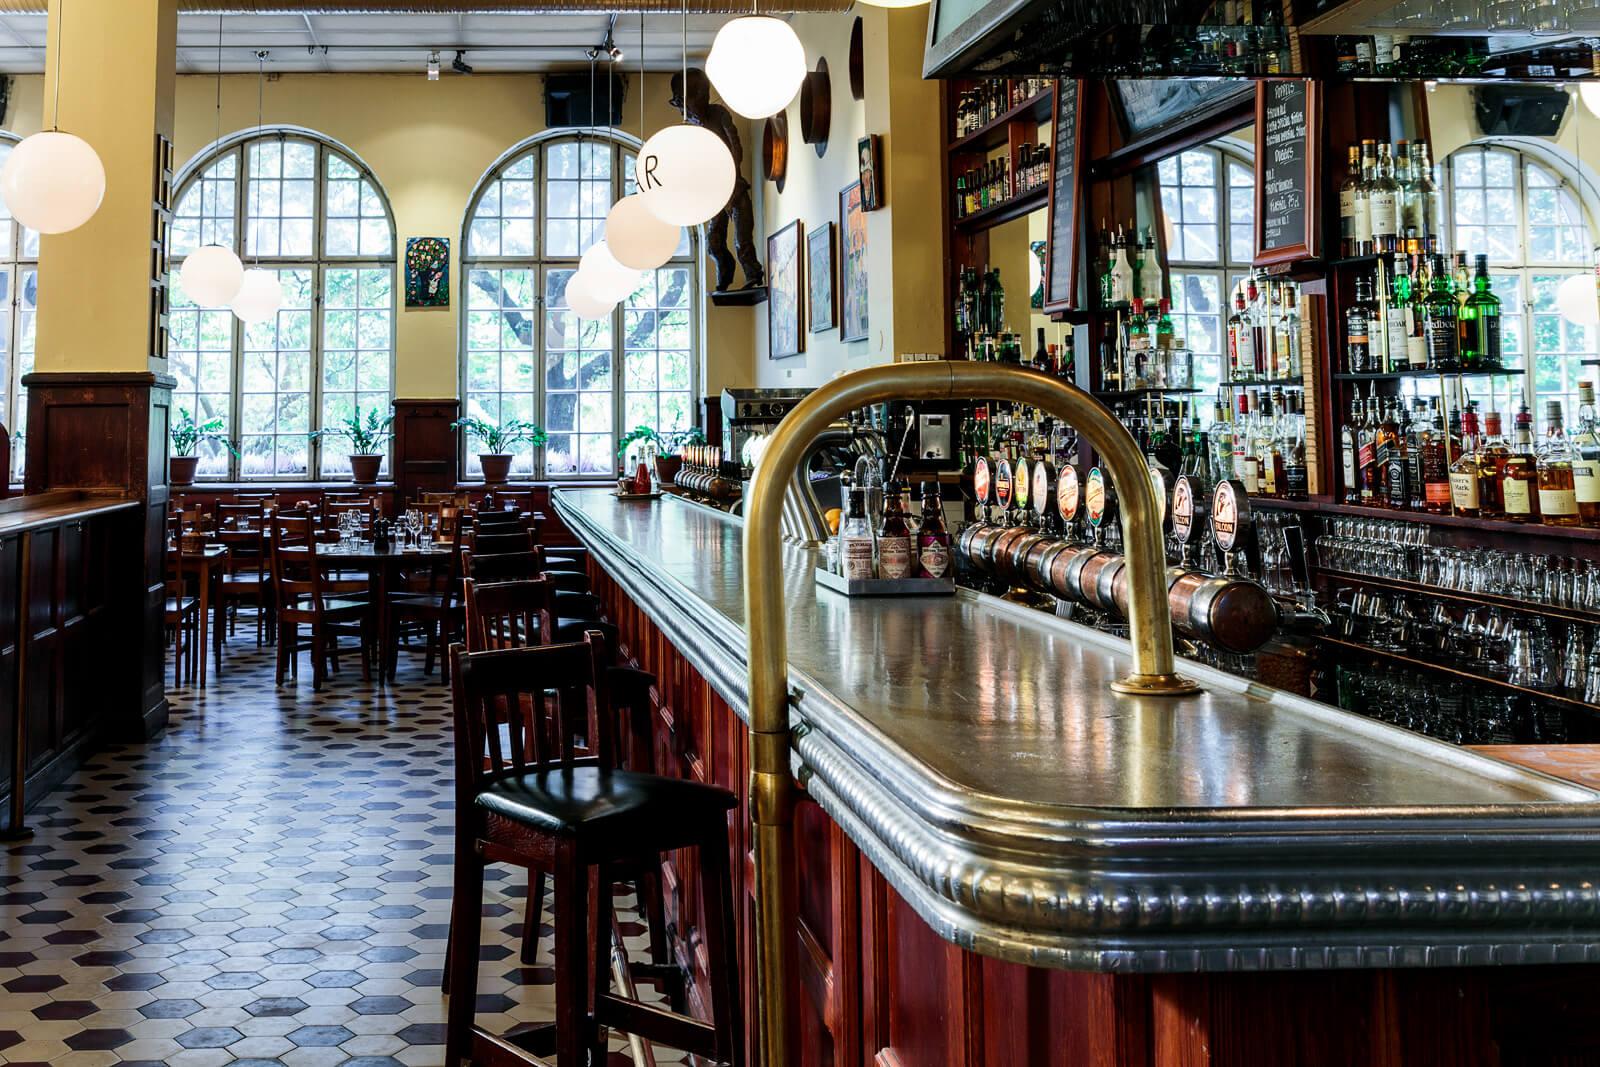 bar and interior at Kvarnen in Stockholm